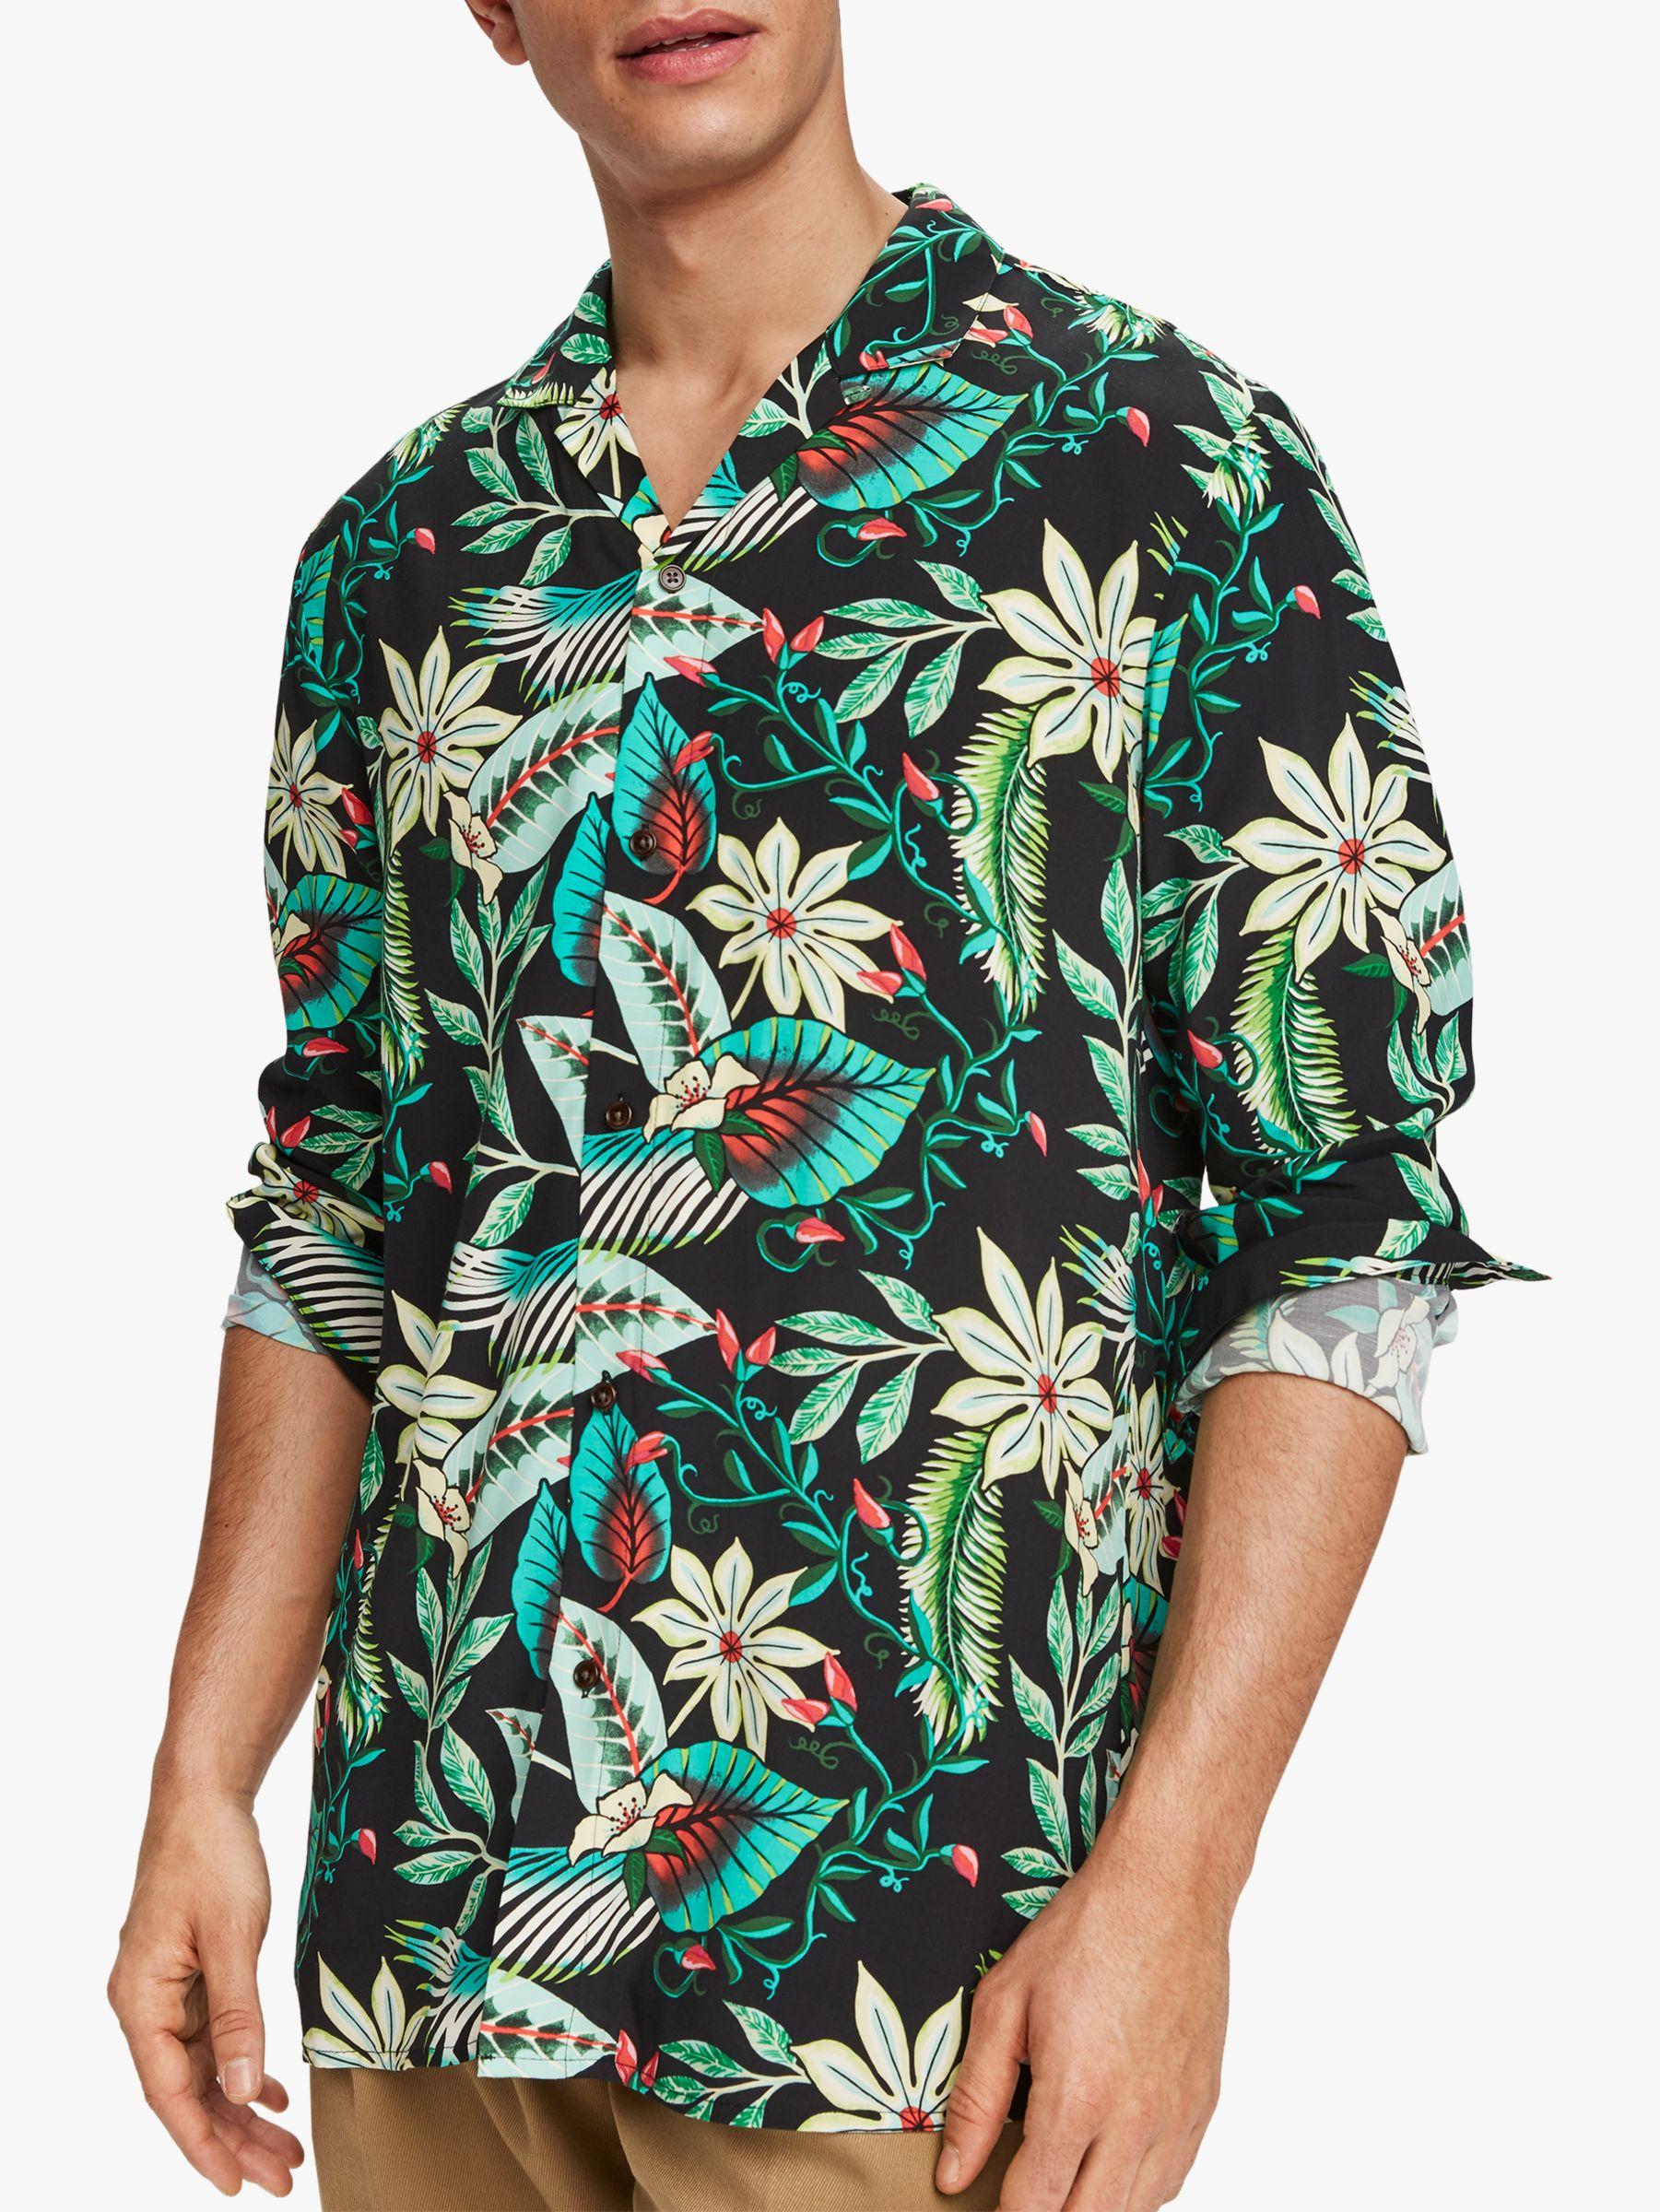 Scotch & Soda Scotch & Soda Hawaiian Print Short Sleeved Shirt, Green/Multi